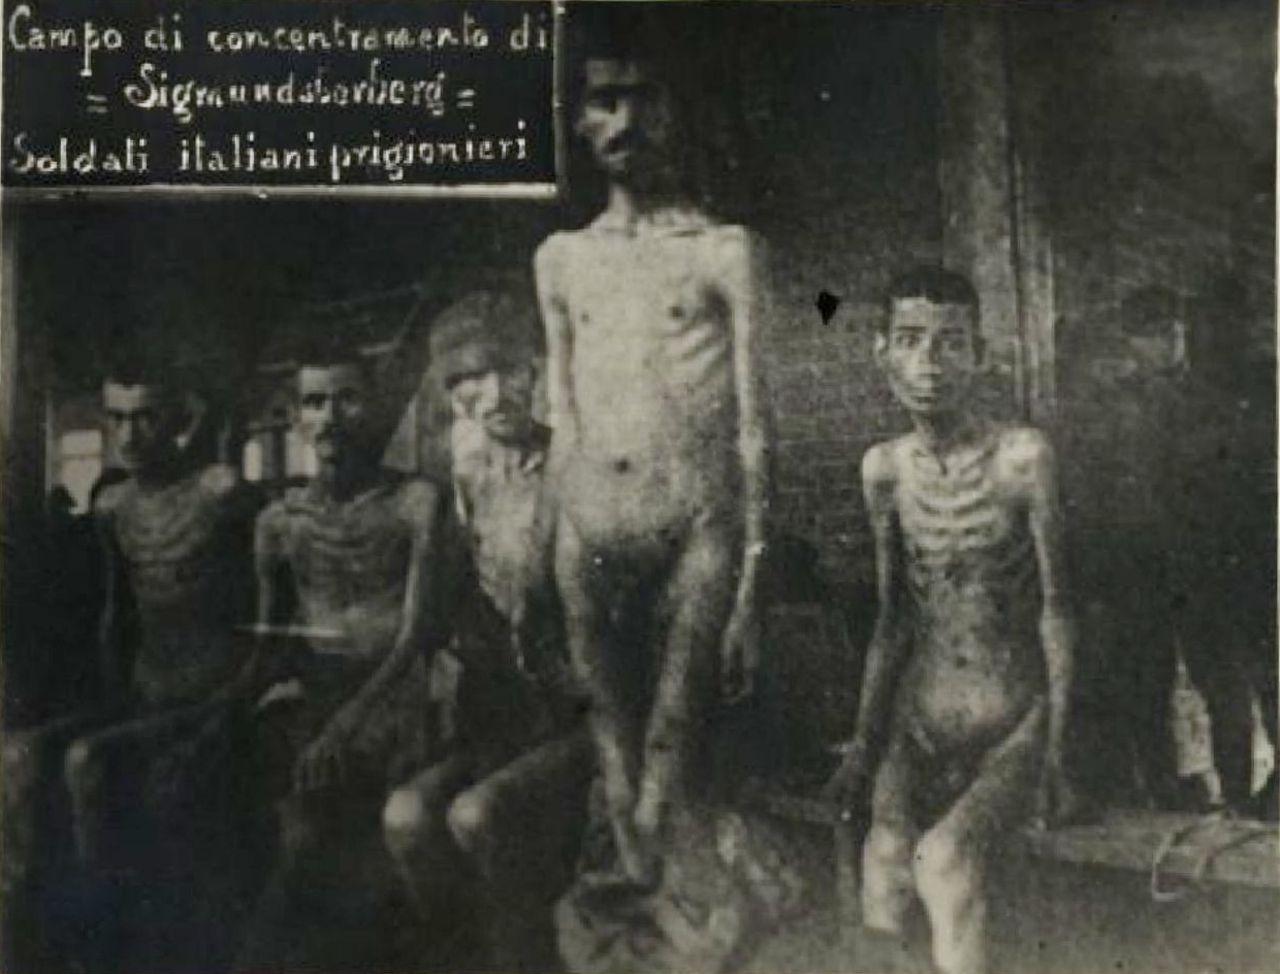 Soldati italiani prigionieri a Sigmundsherberg